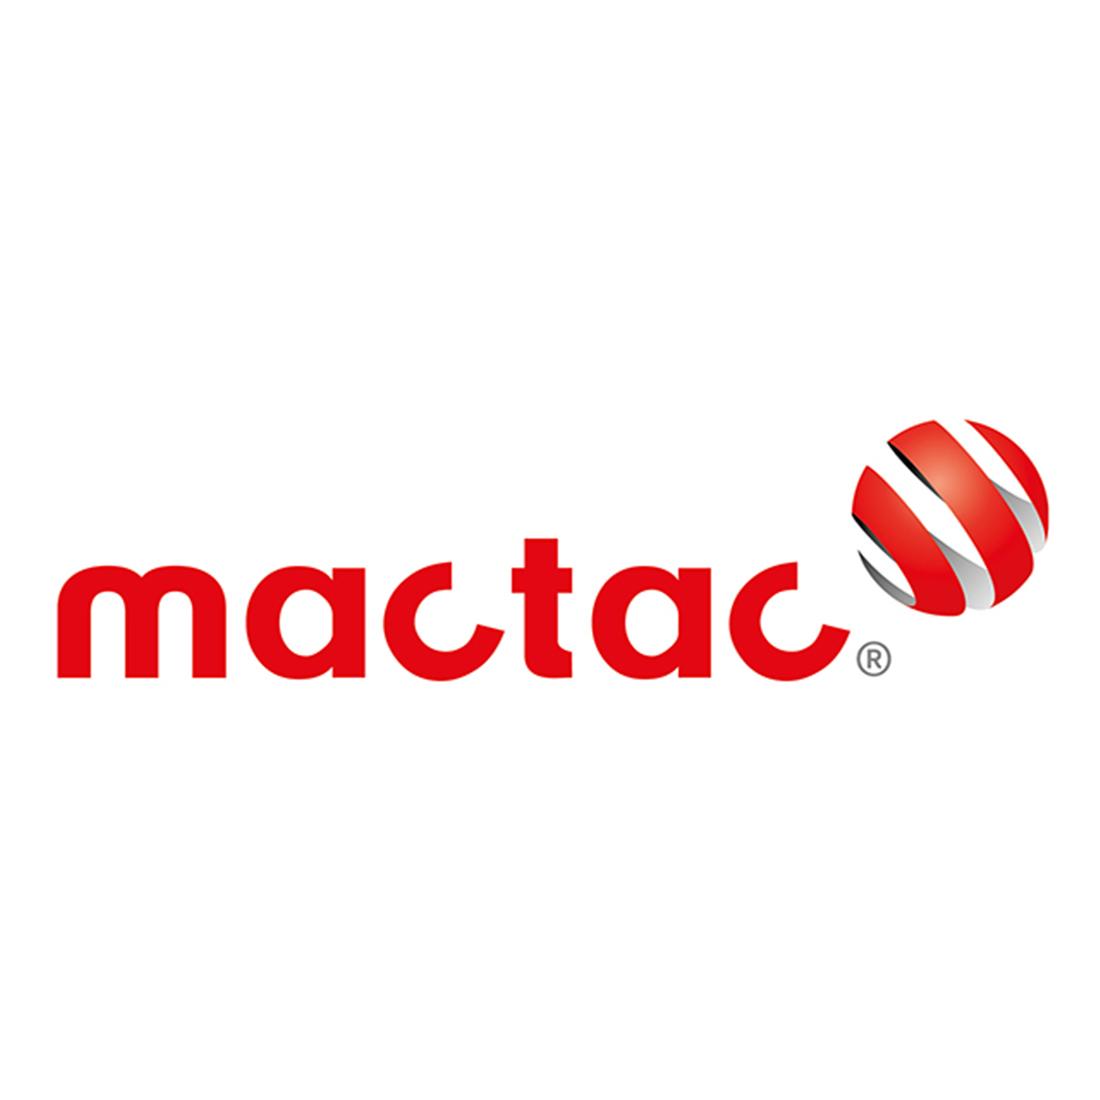 Mactac Premiumfolien Bogenware